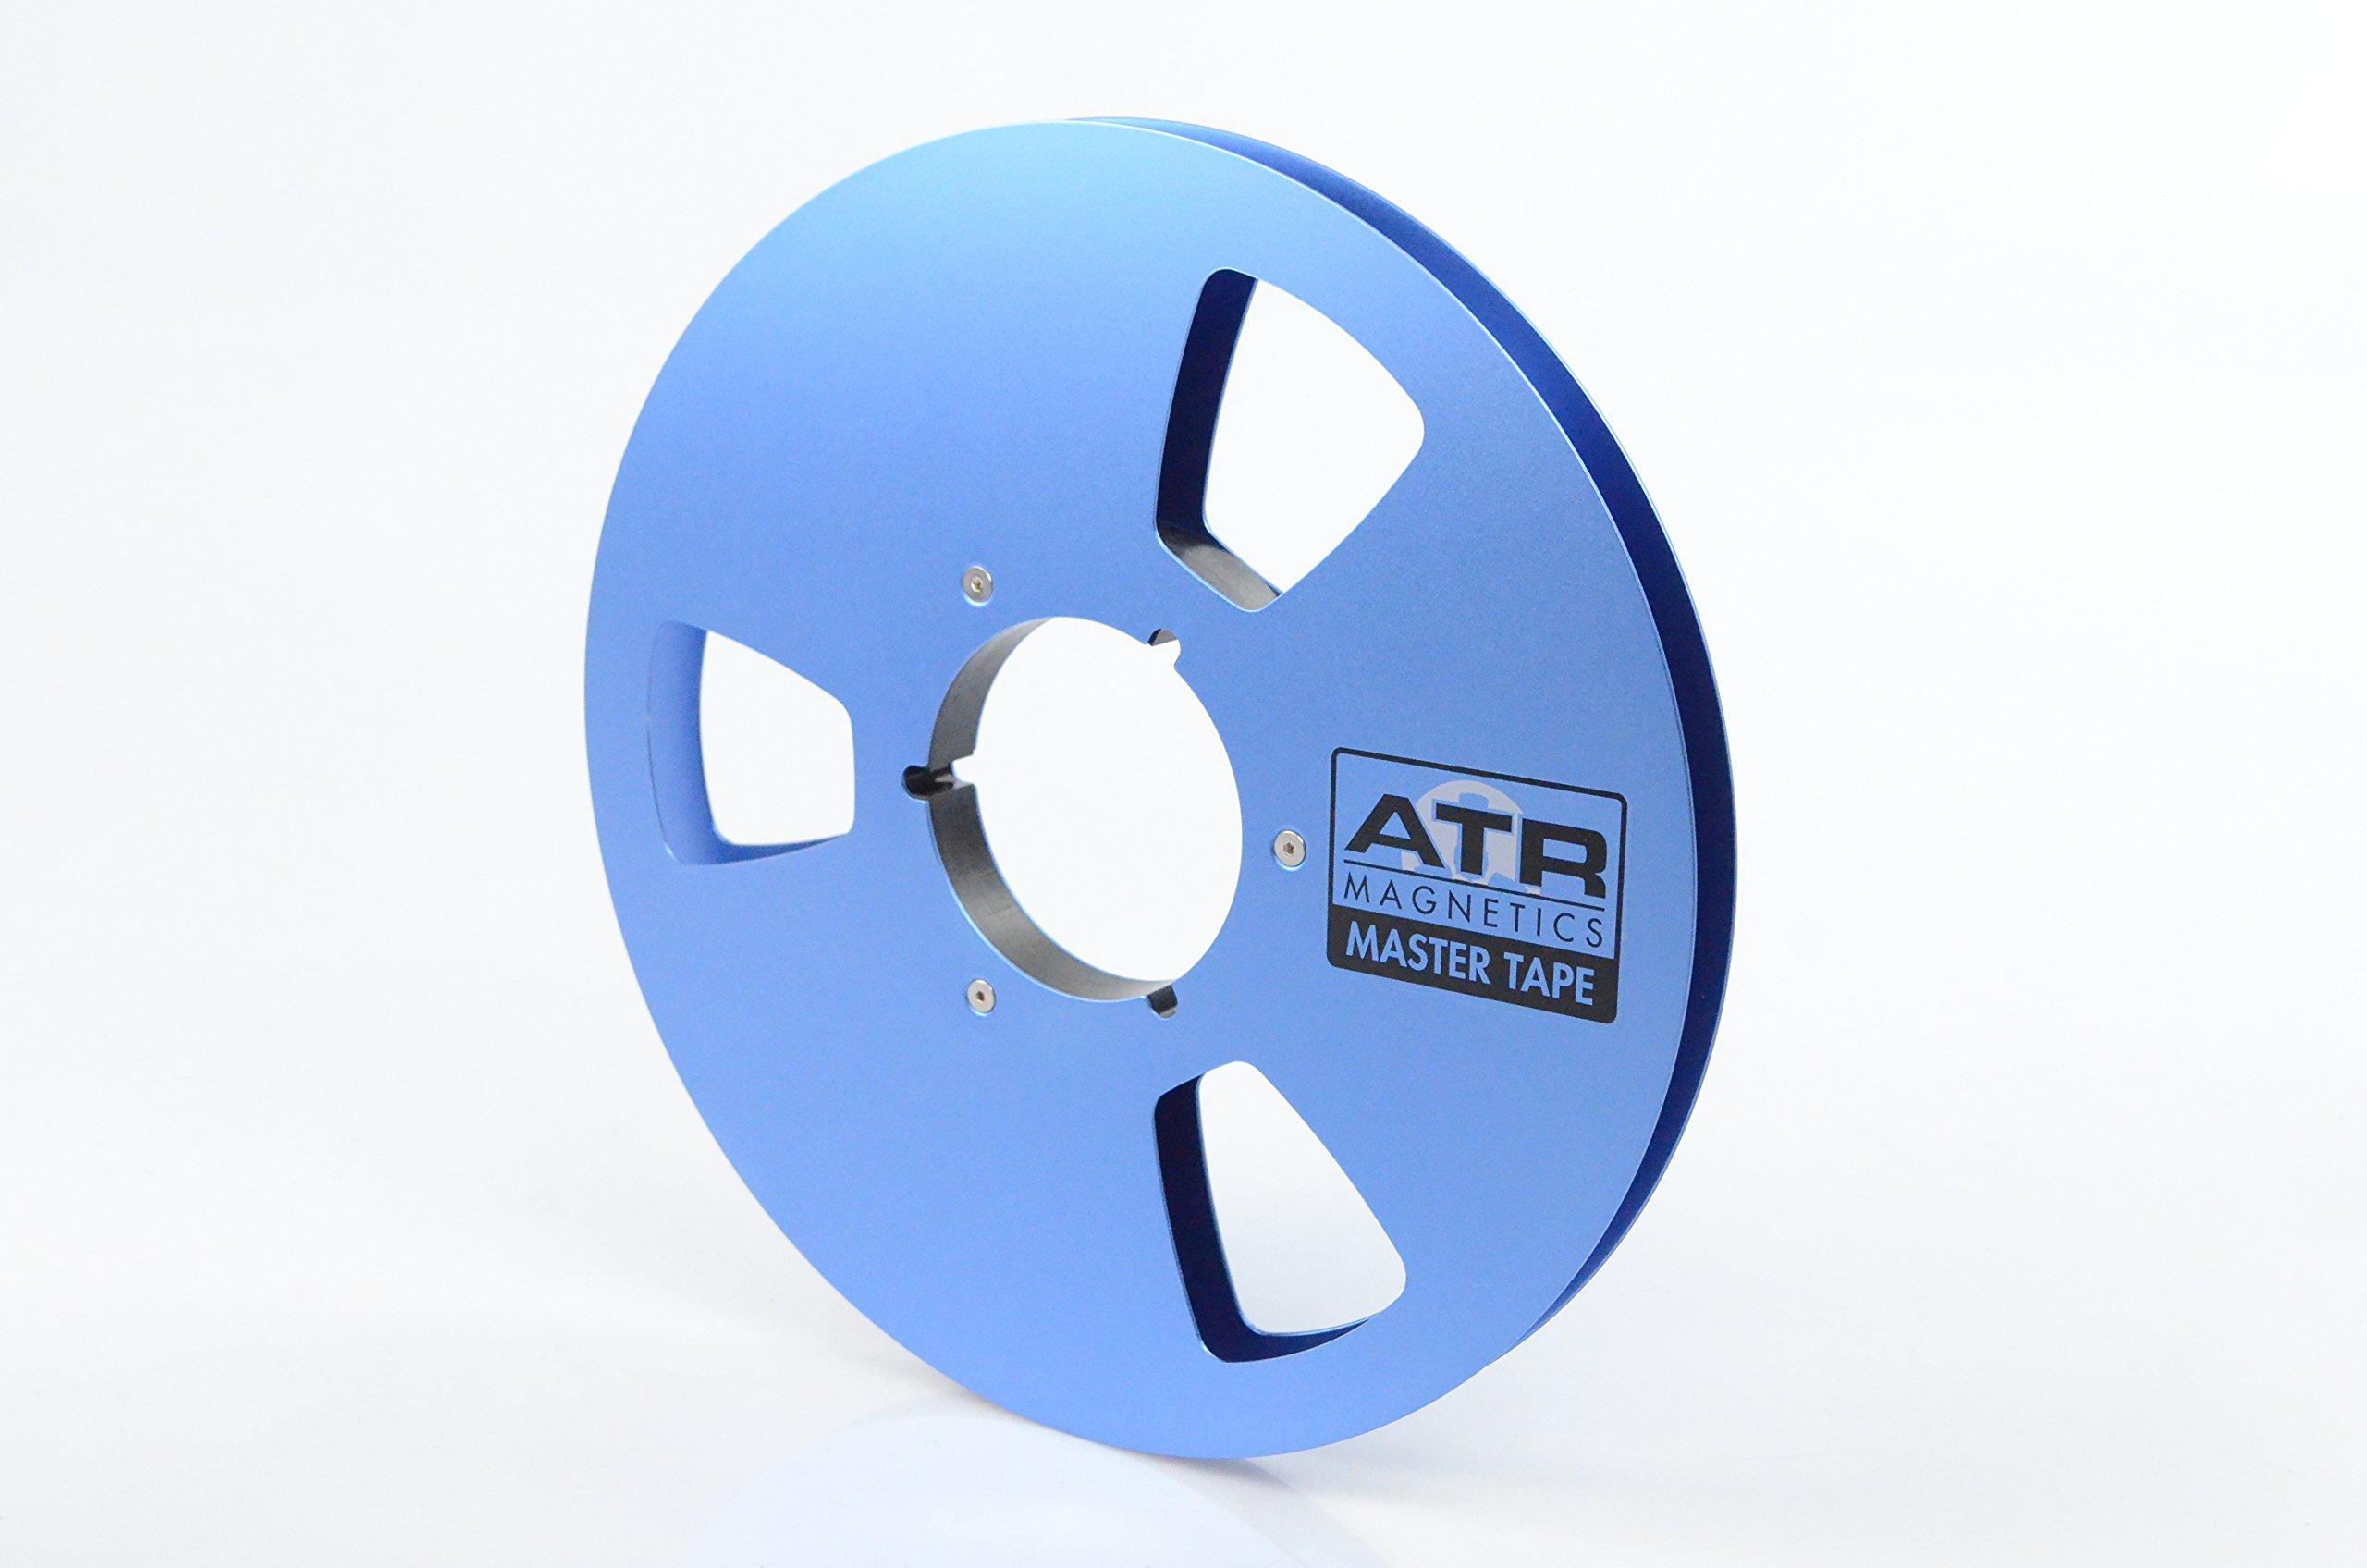 ATR Magnetics 1/2'' Master Tape | 10.5'' Reel | Empty